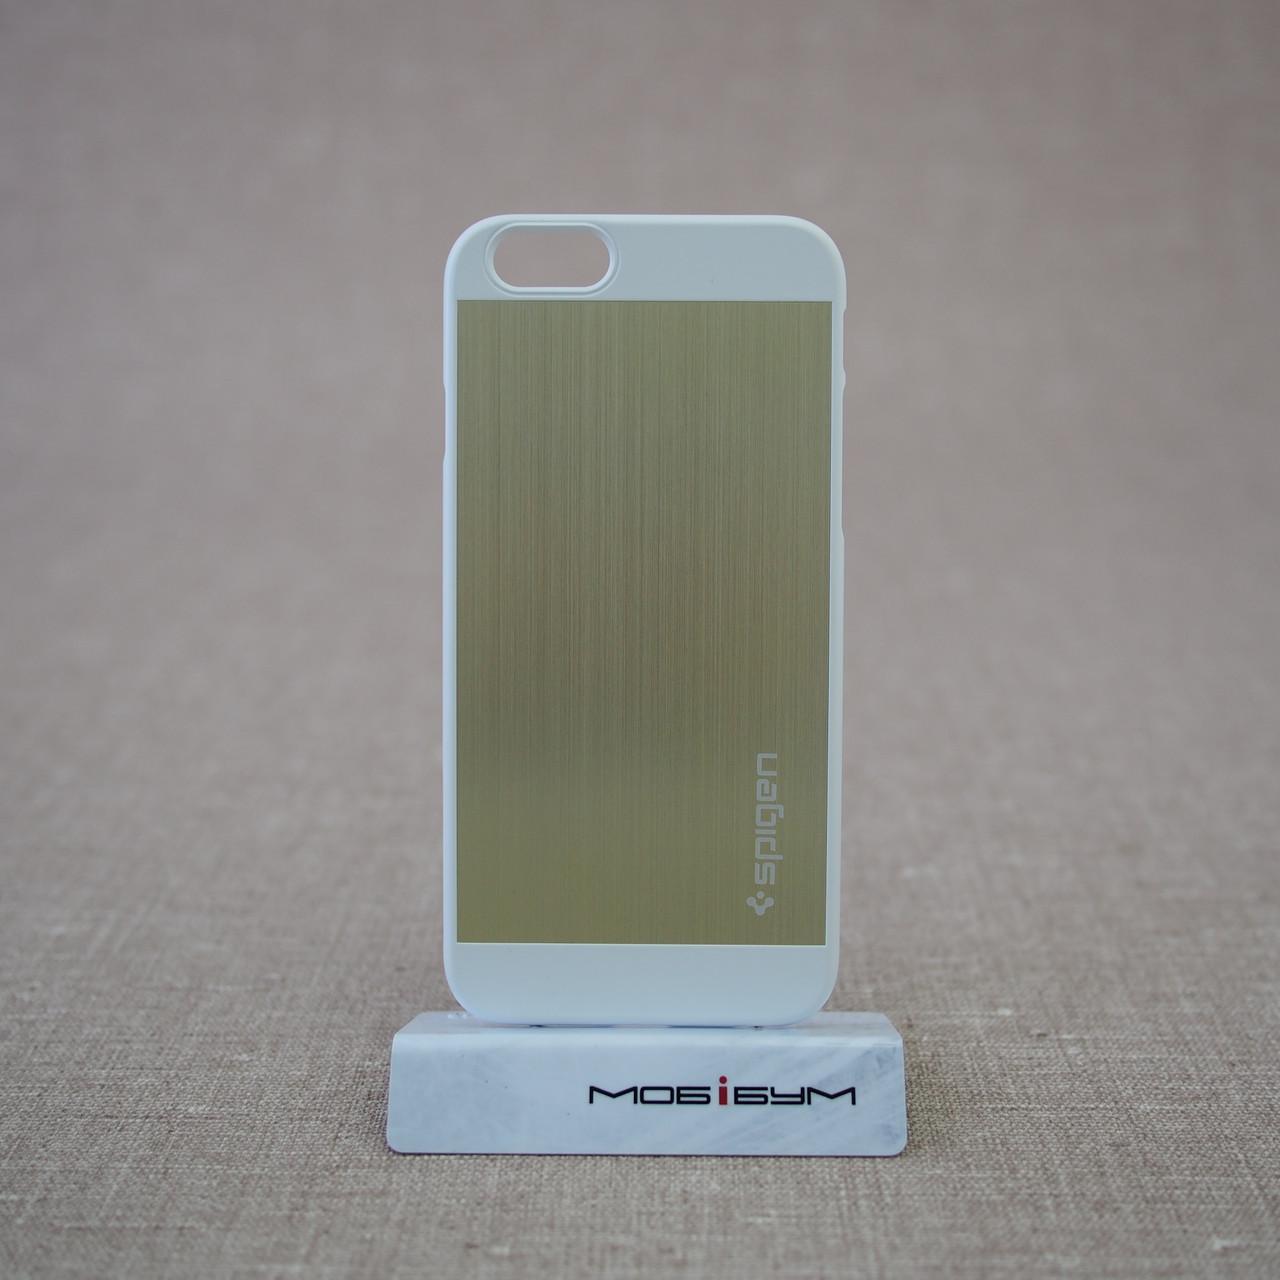 Чехол Spigen Aluminum Fit iPhone 6 champagne gold (SGP10945) EAN/UPC: 8809404212673